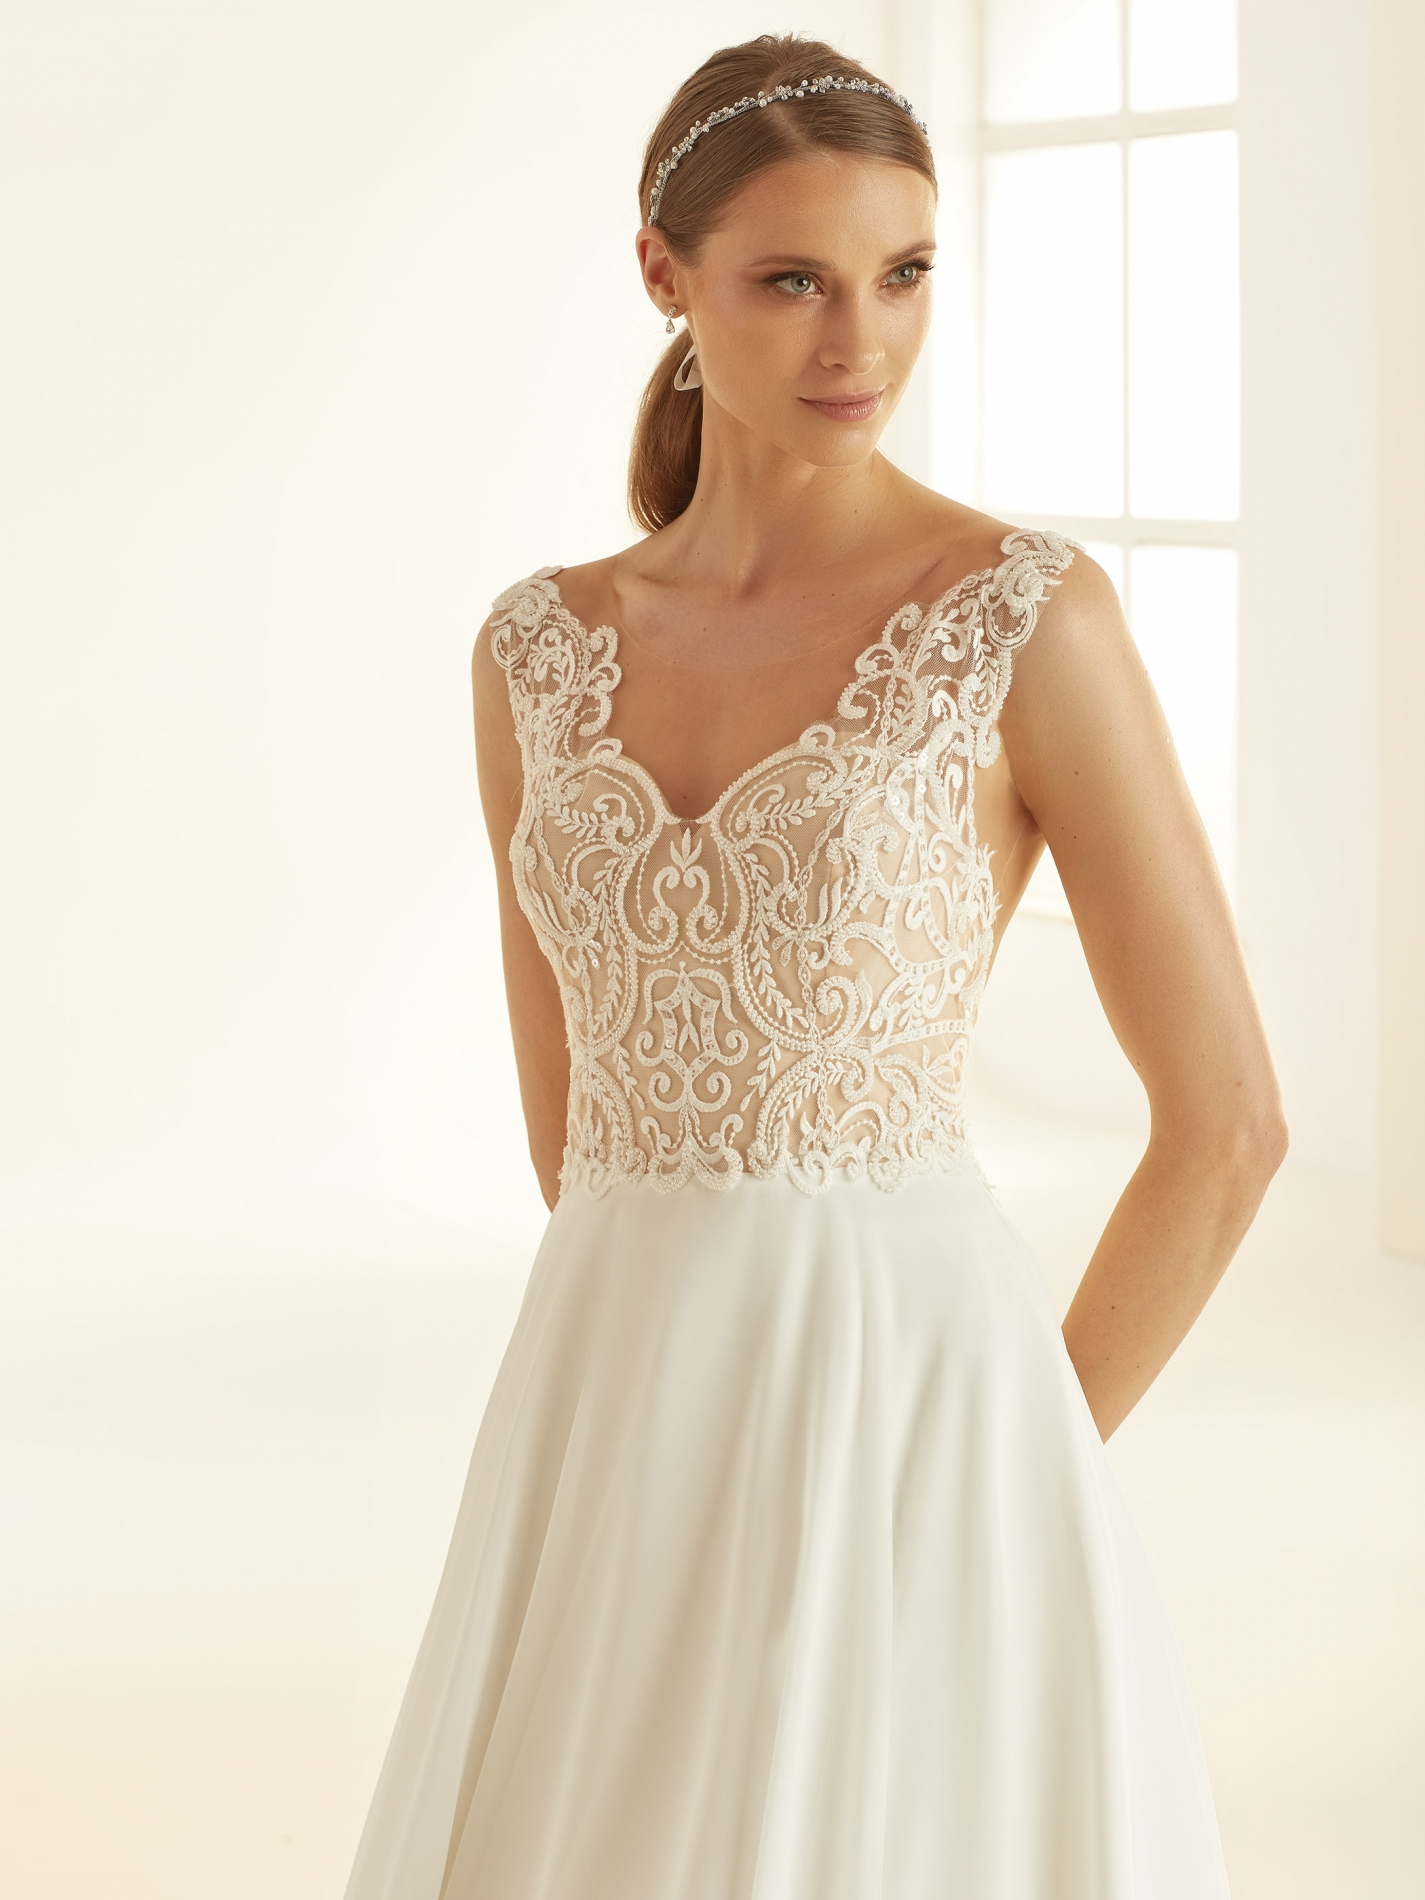 PANDORA_nude-Bianco-Evento-bridal-dress-(2)